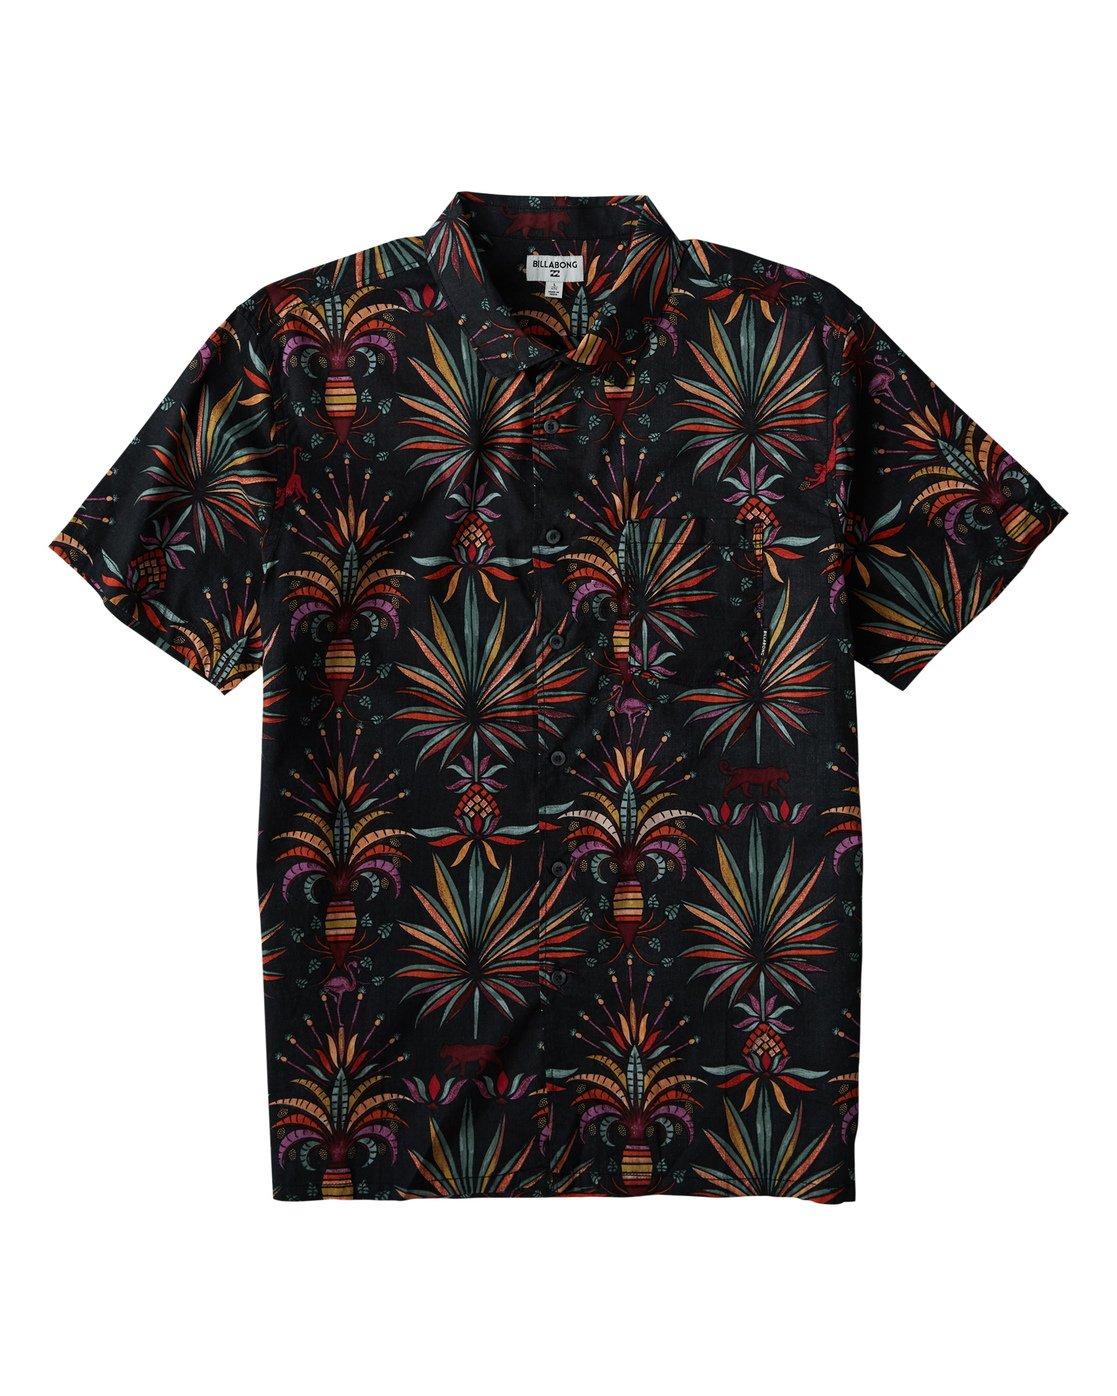 69489dd3 Sundays Floral Short Sleeve Shirt